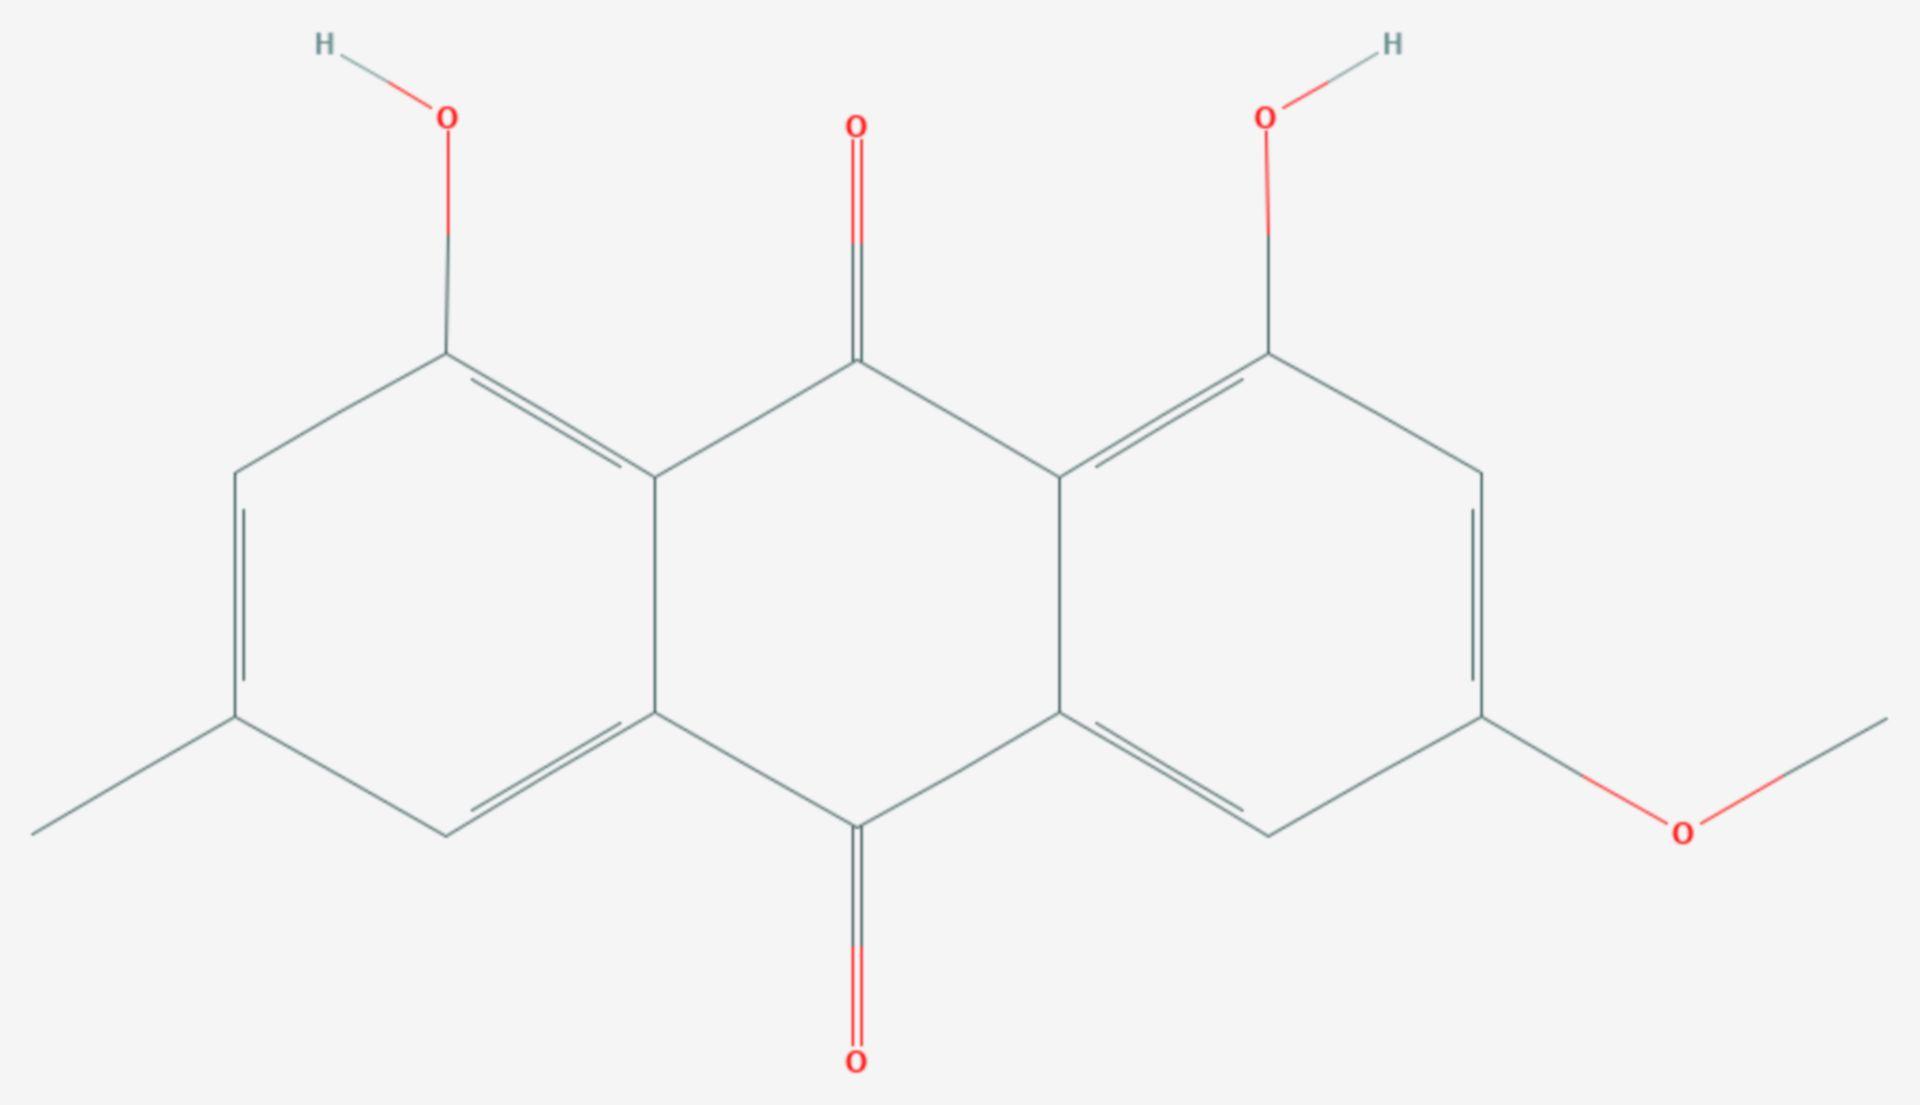 Parietin (Strukturformel)